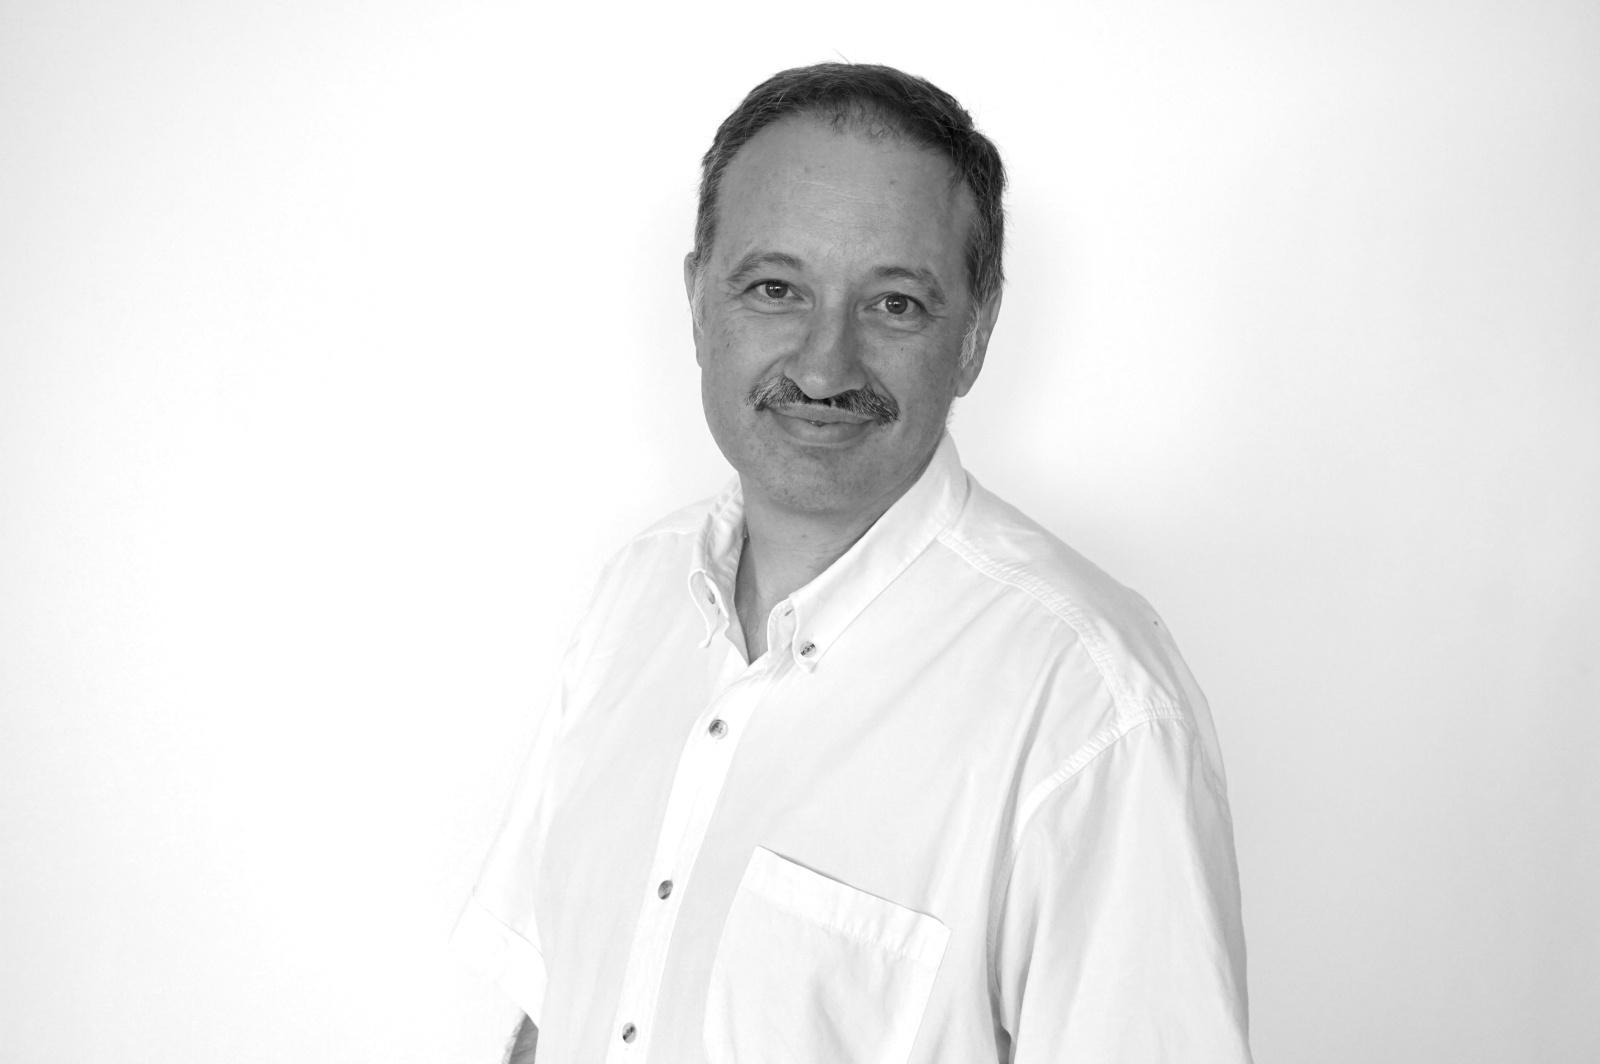 Jean-Louis Faraon